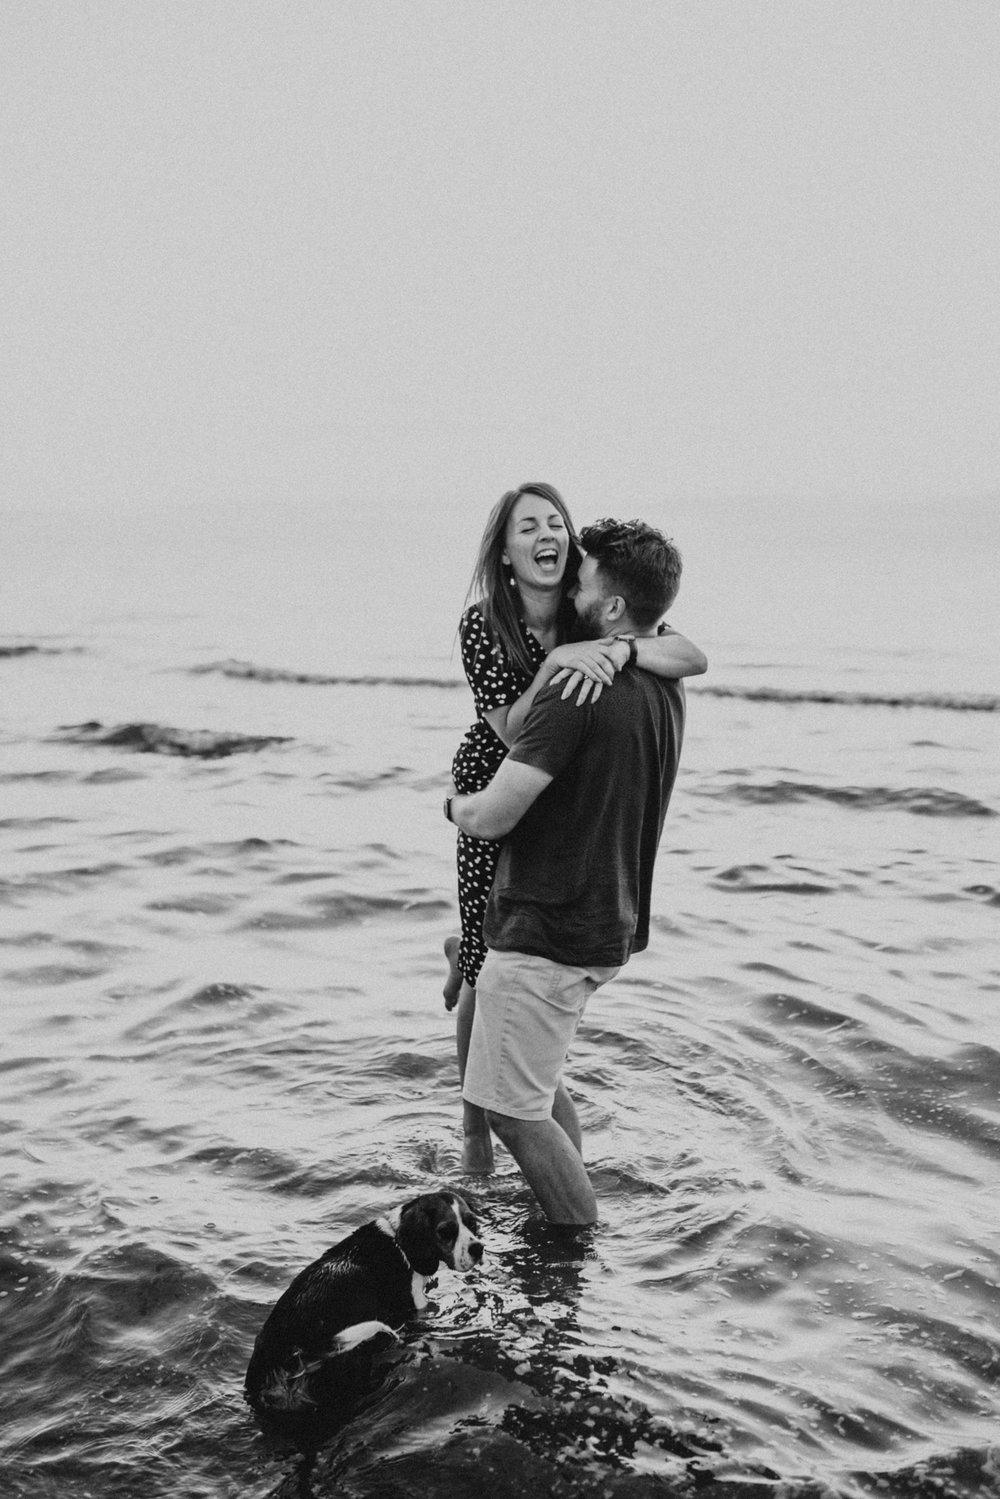 Katrina-Mike-Engagement-Beach-Coastal-Dog-Session-Shoot-Photography-Darina-Stoda-Norfolk-100.jpg